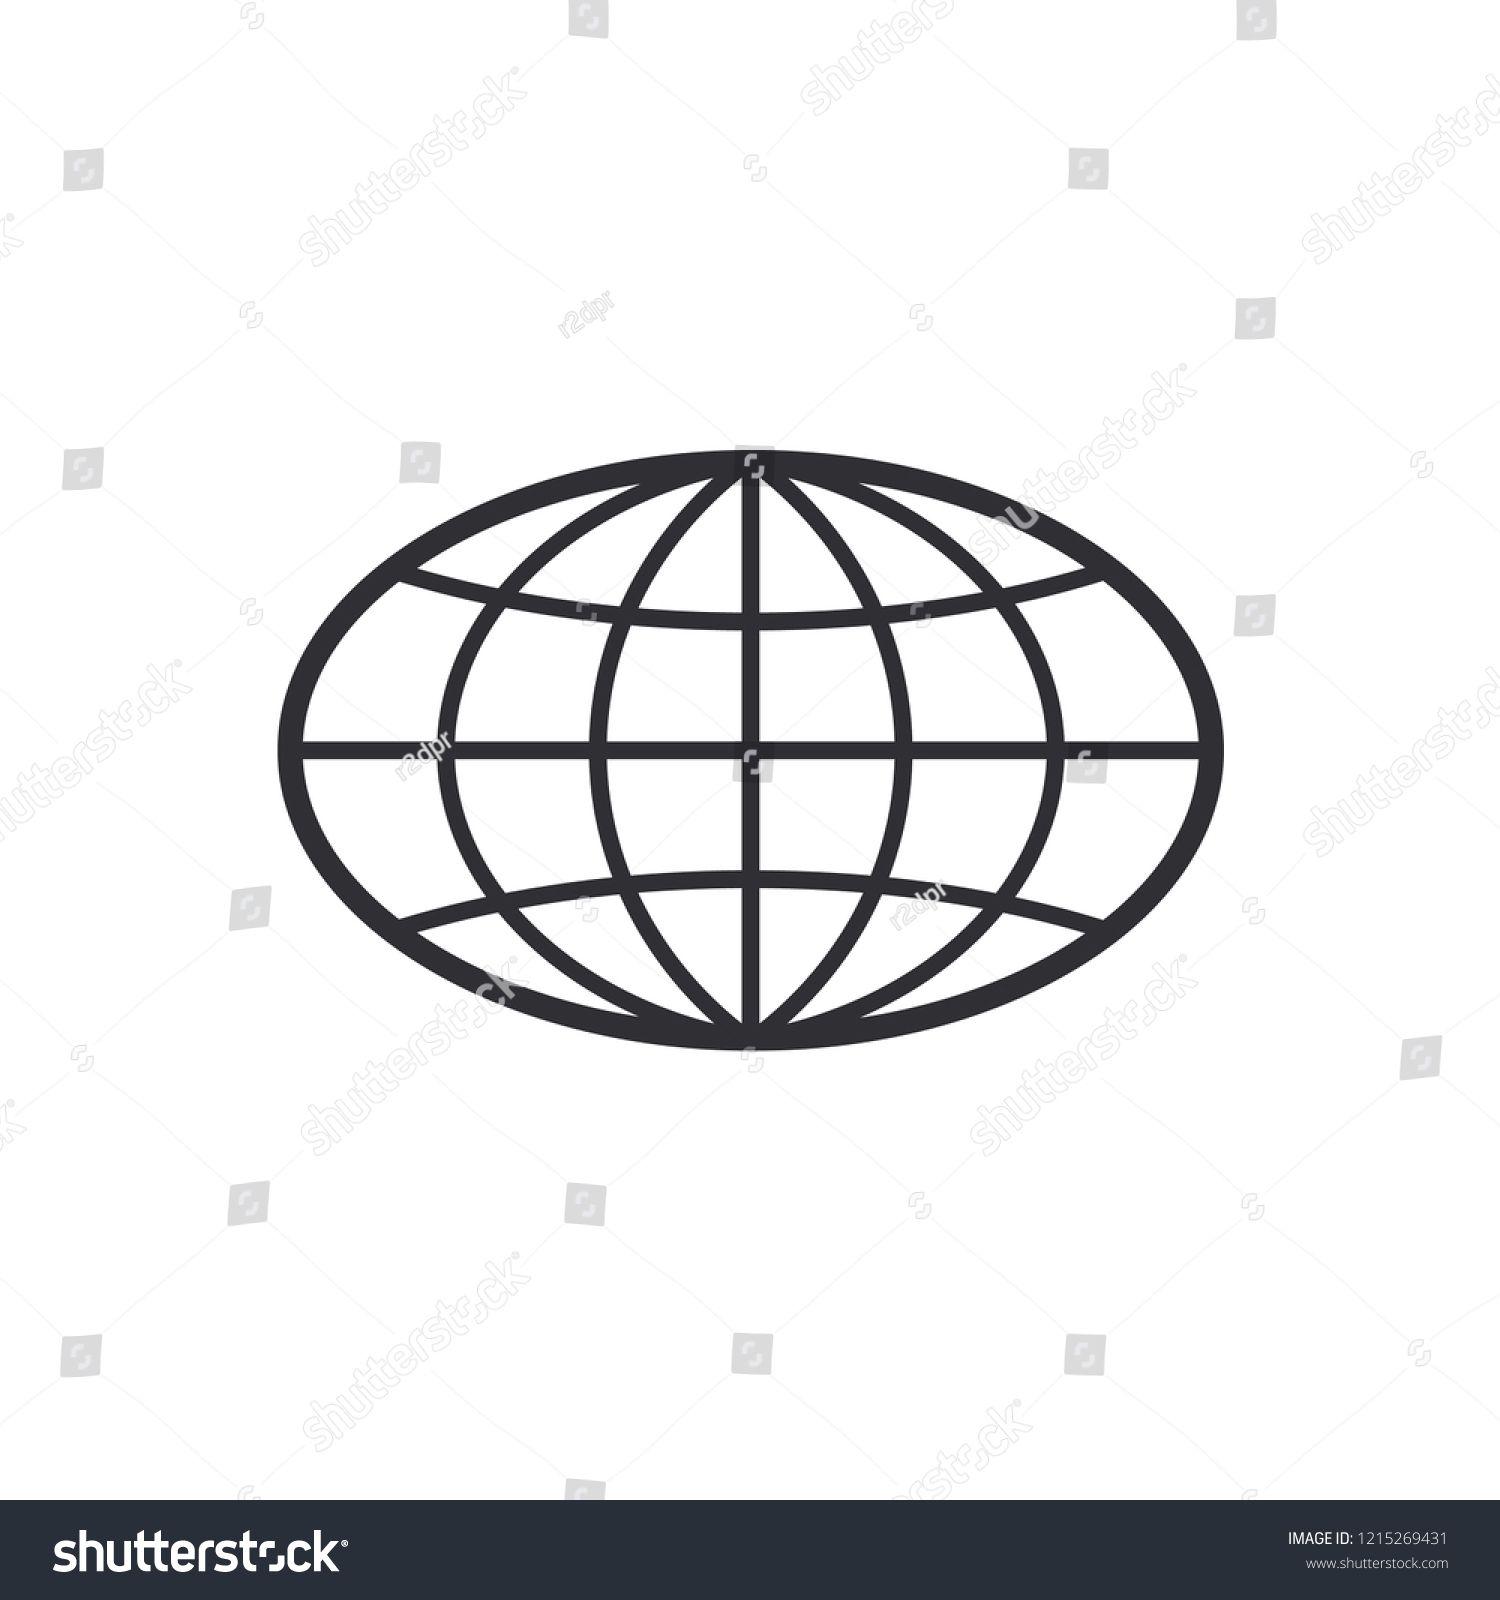 Globe Icon World Symbol Oval Globe Icon World Globe Symbol Earth Sign Color Easy To Edit Transparent Background N S Globe Icon Oval Logo Globe Vector